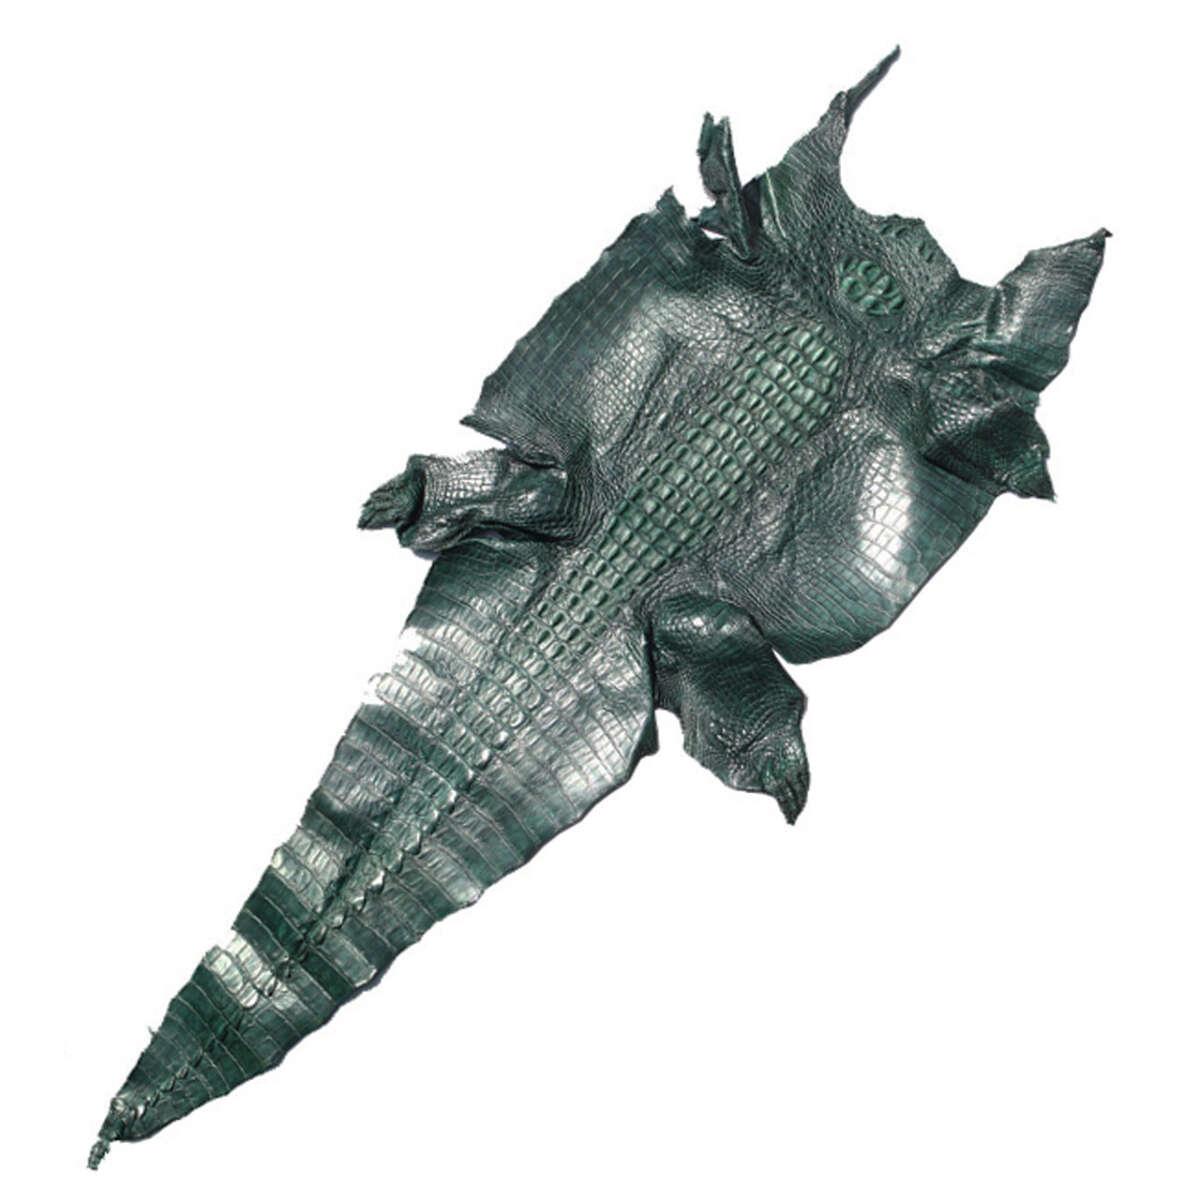 Da cá sấu thuộc S1221d